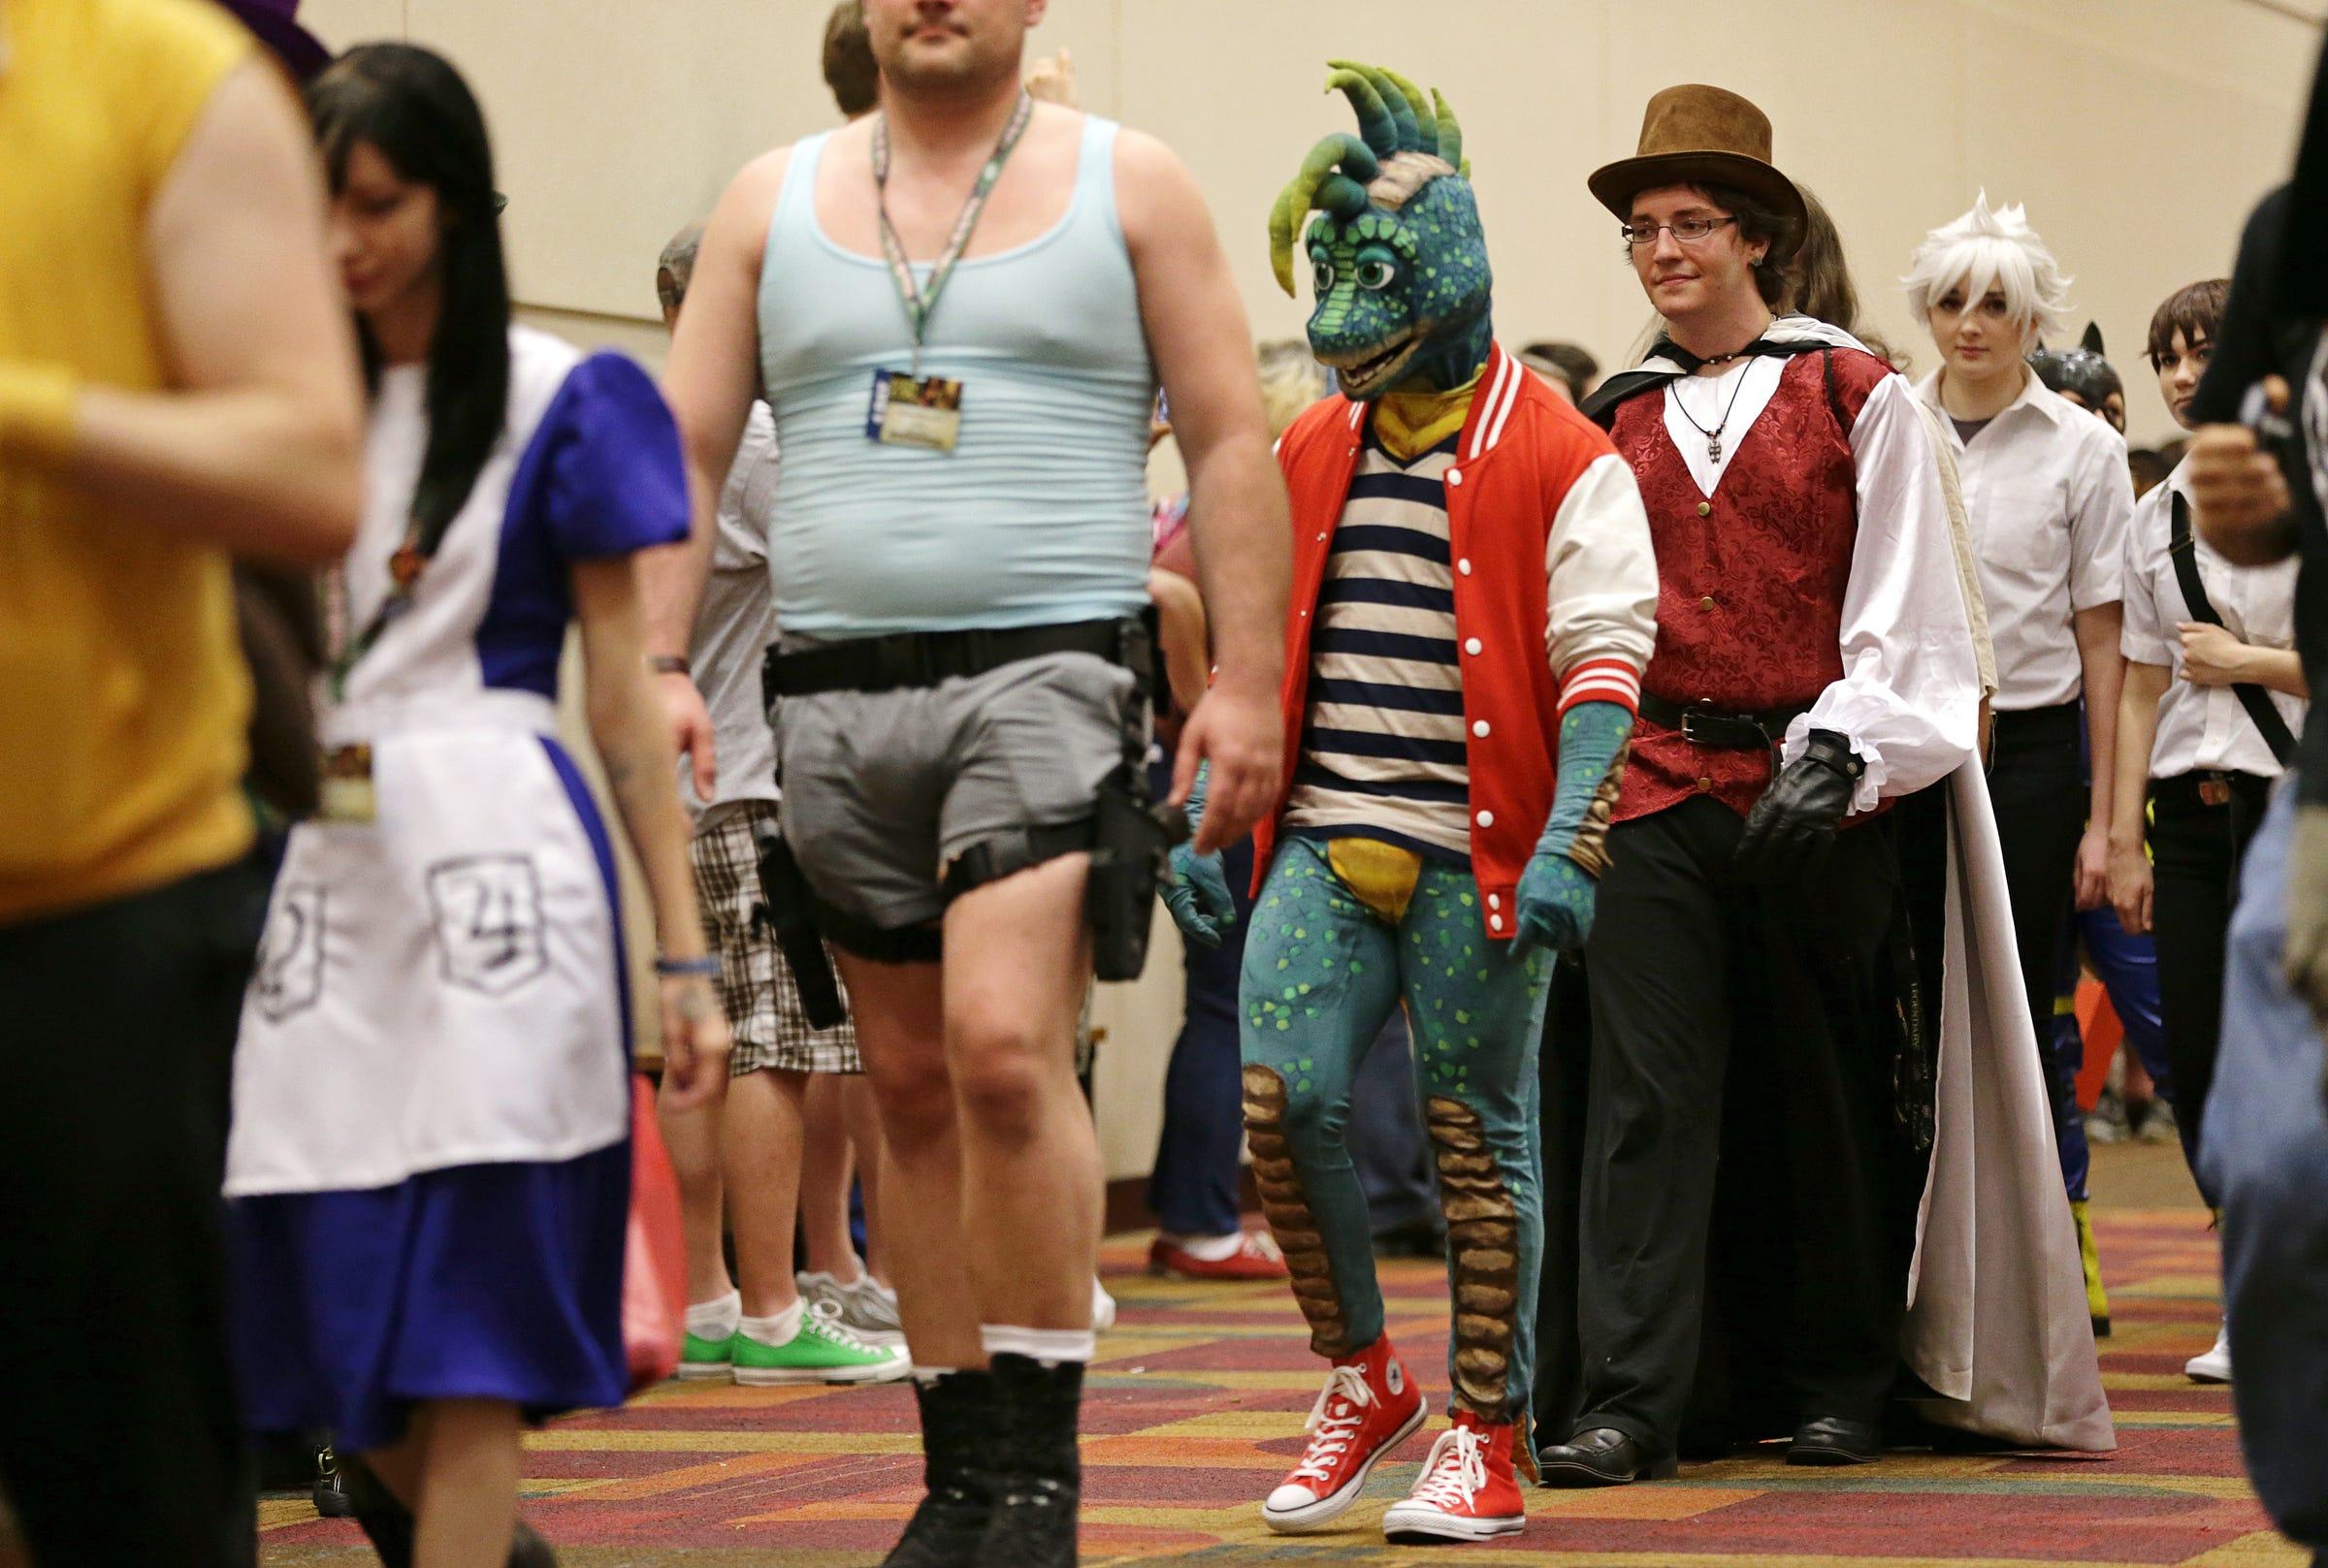 Gencon costume contest prizes